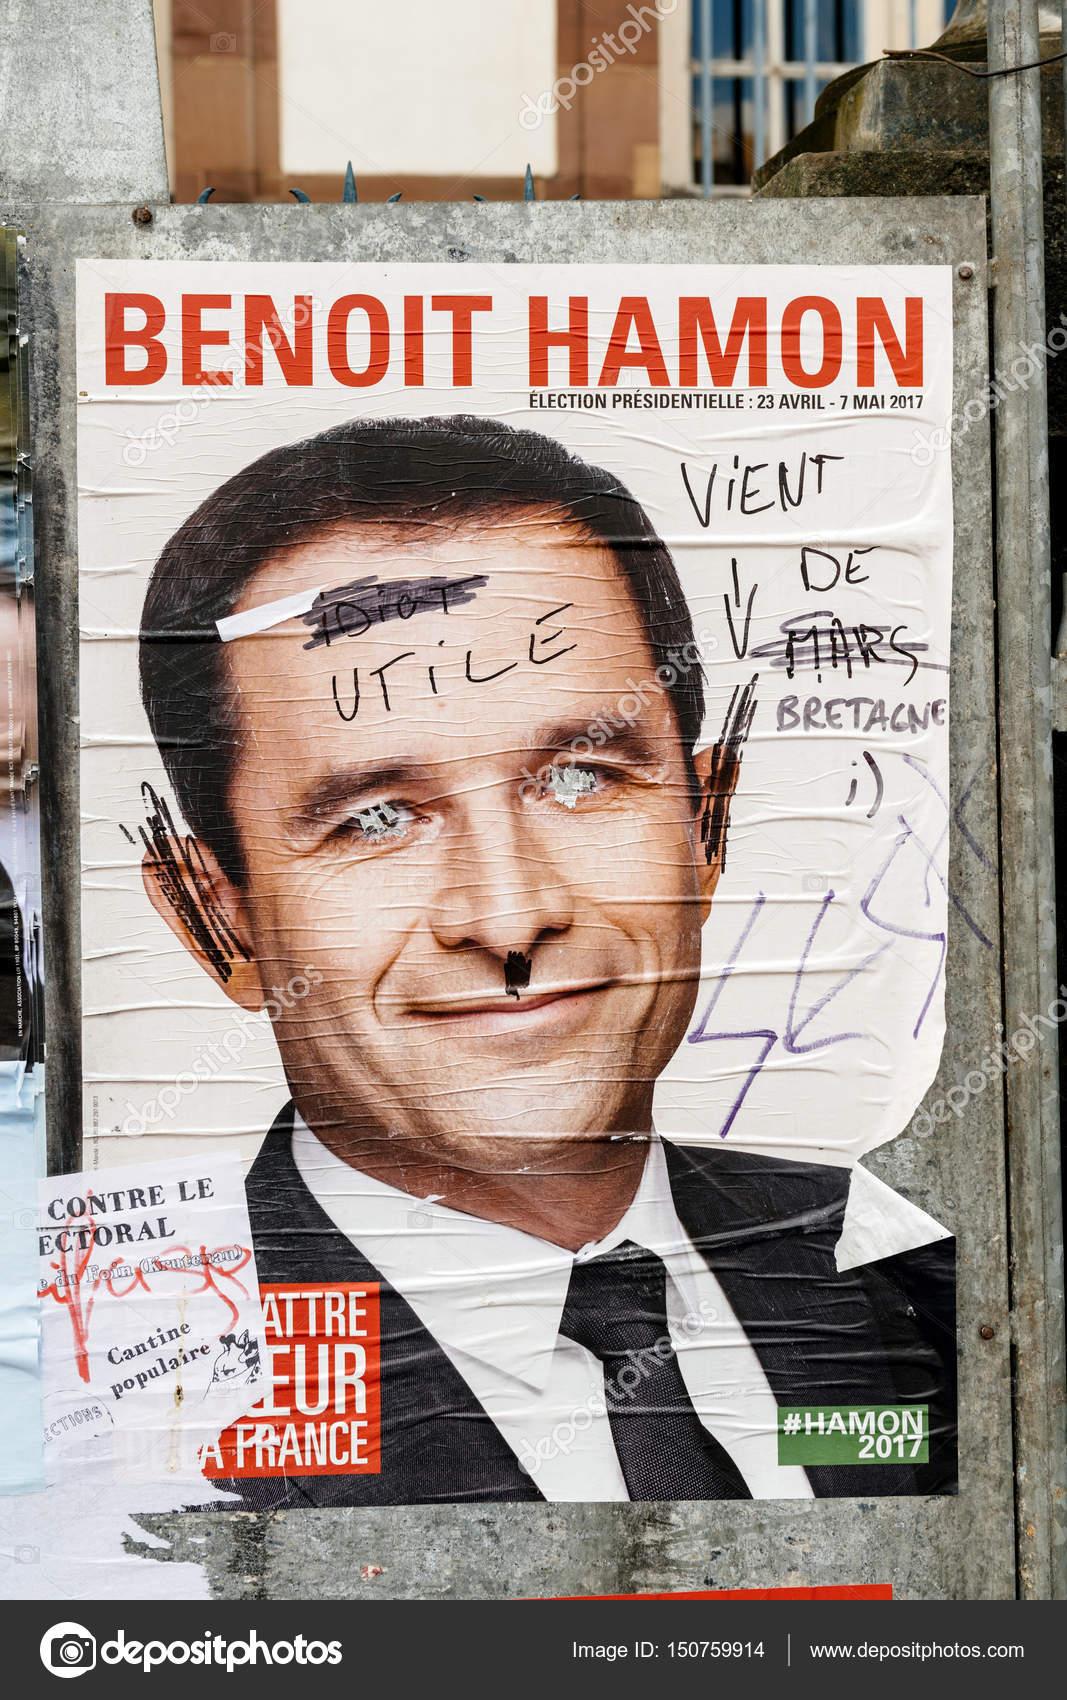 Benoit Hamon Francuski Prezydenckich Plakaty Kampanii